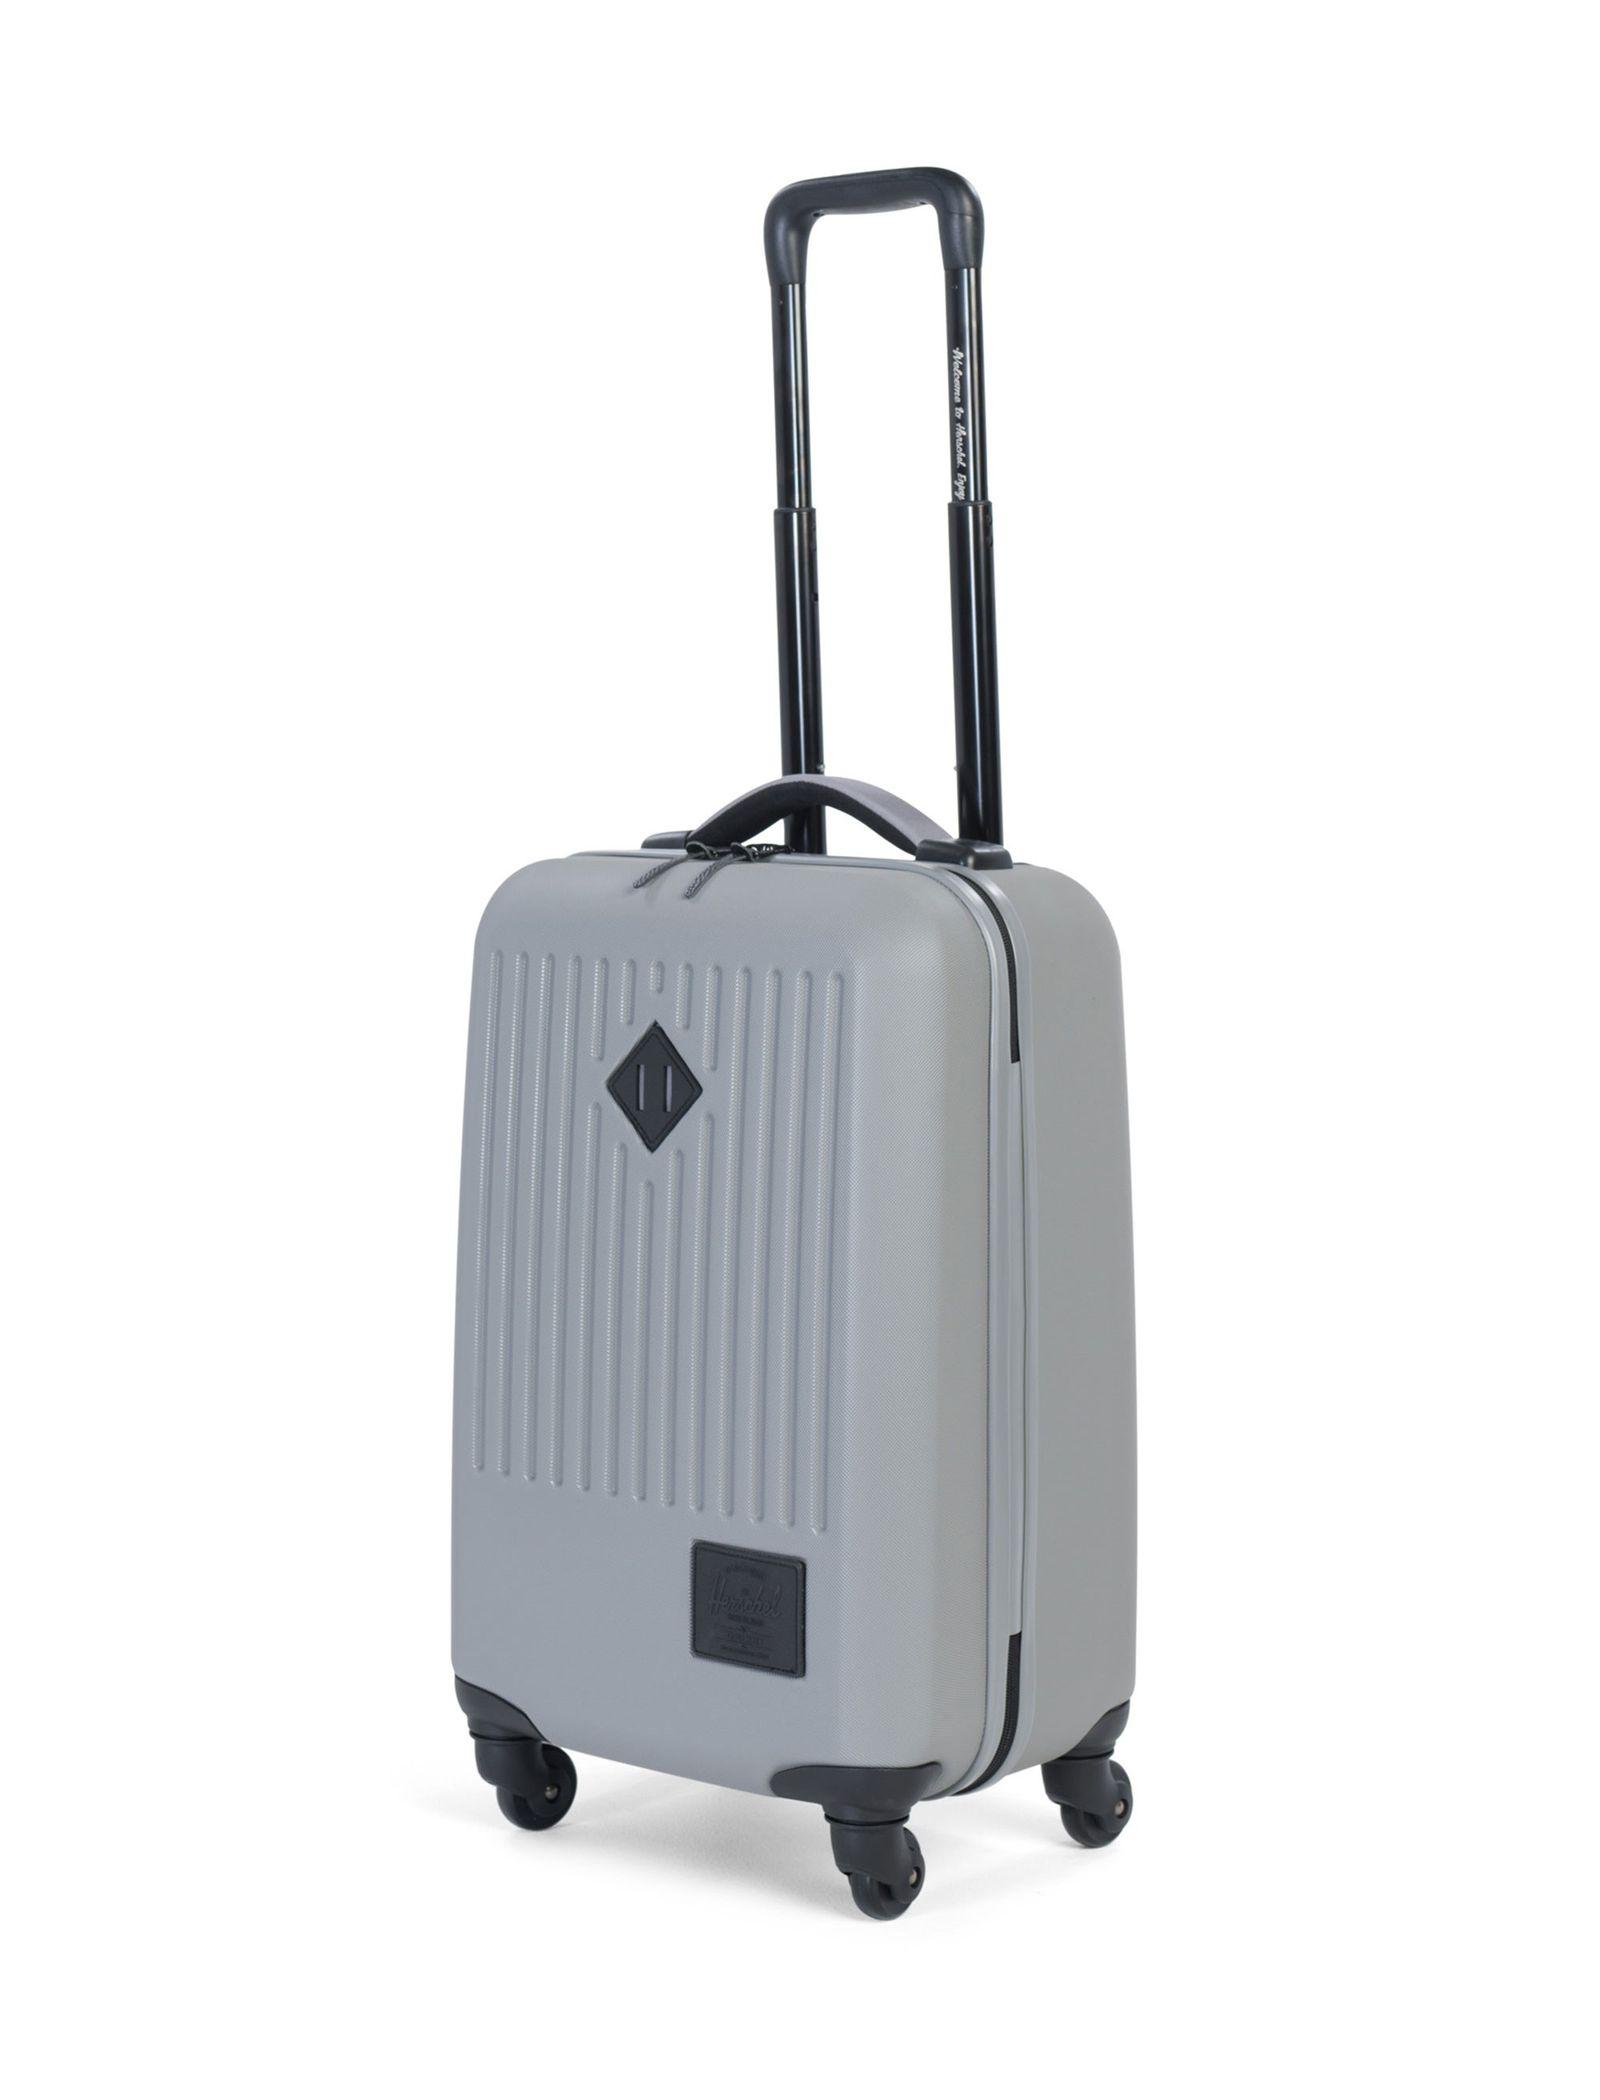 چمدان Trade Small - هرشل - طوسي - 3